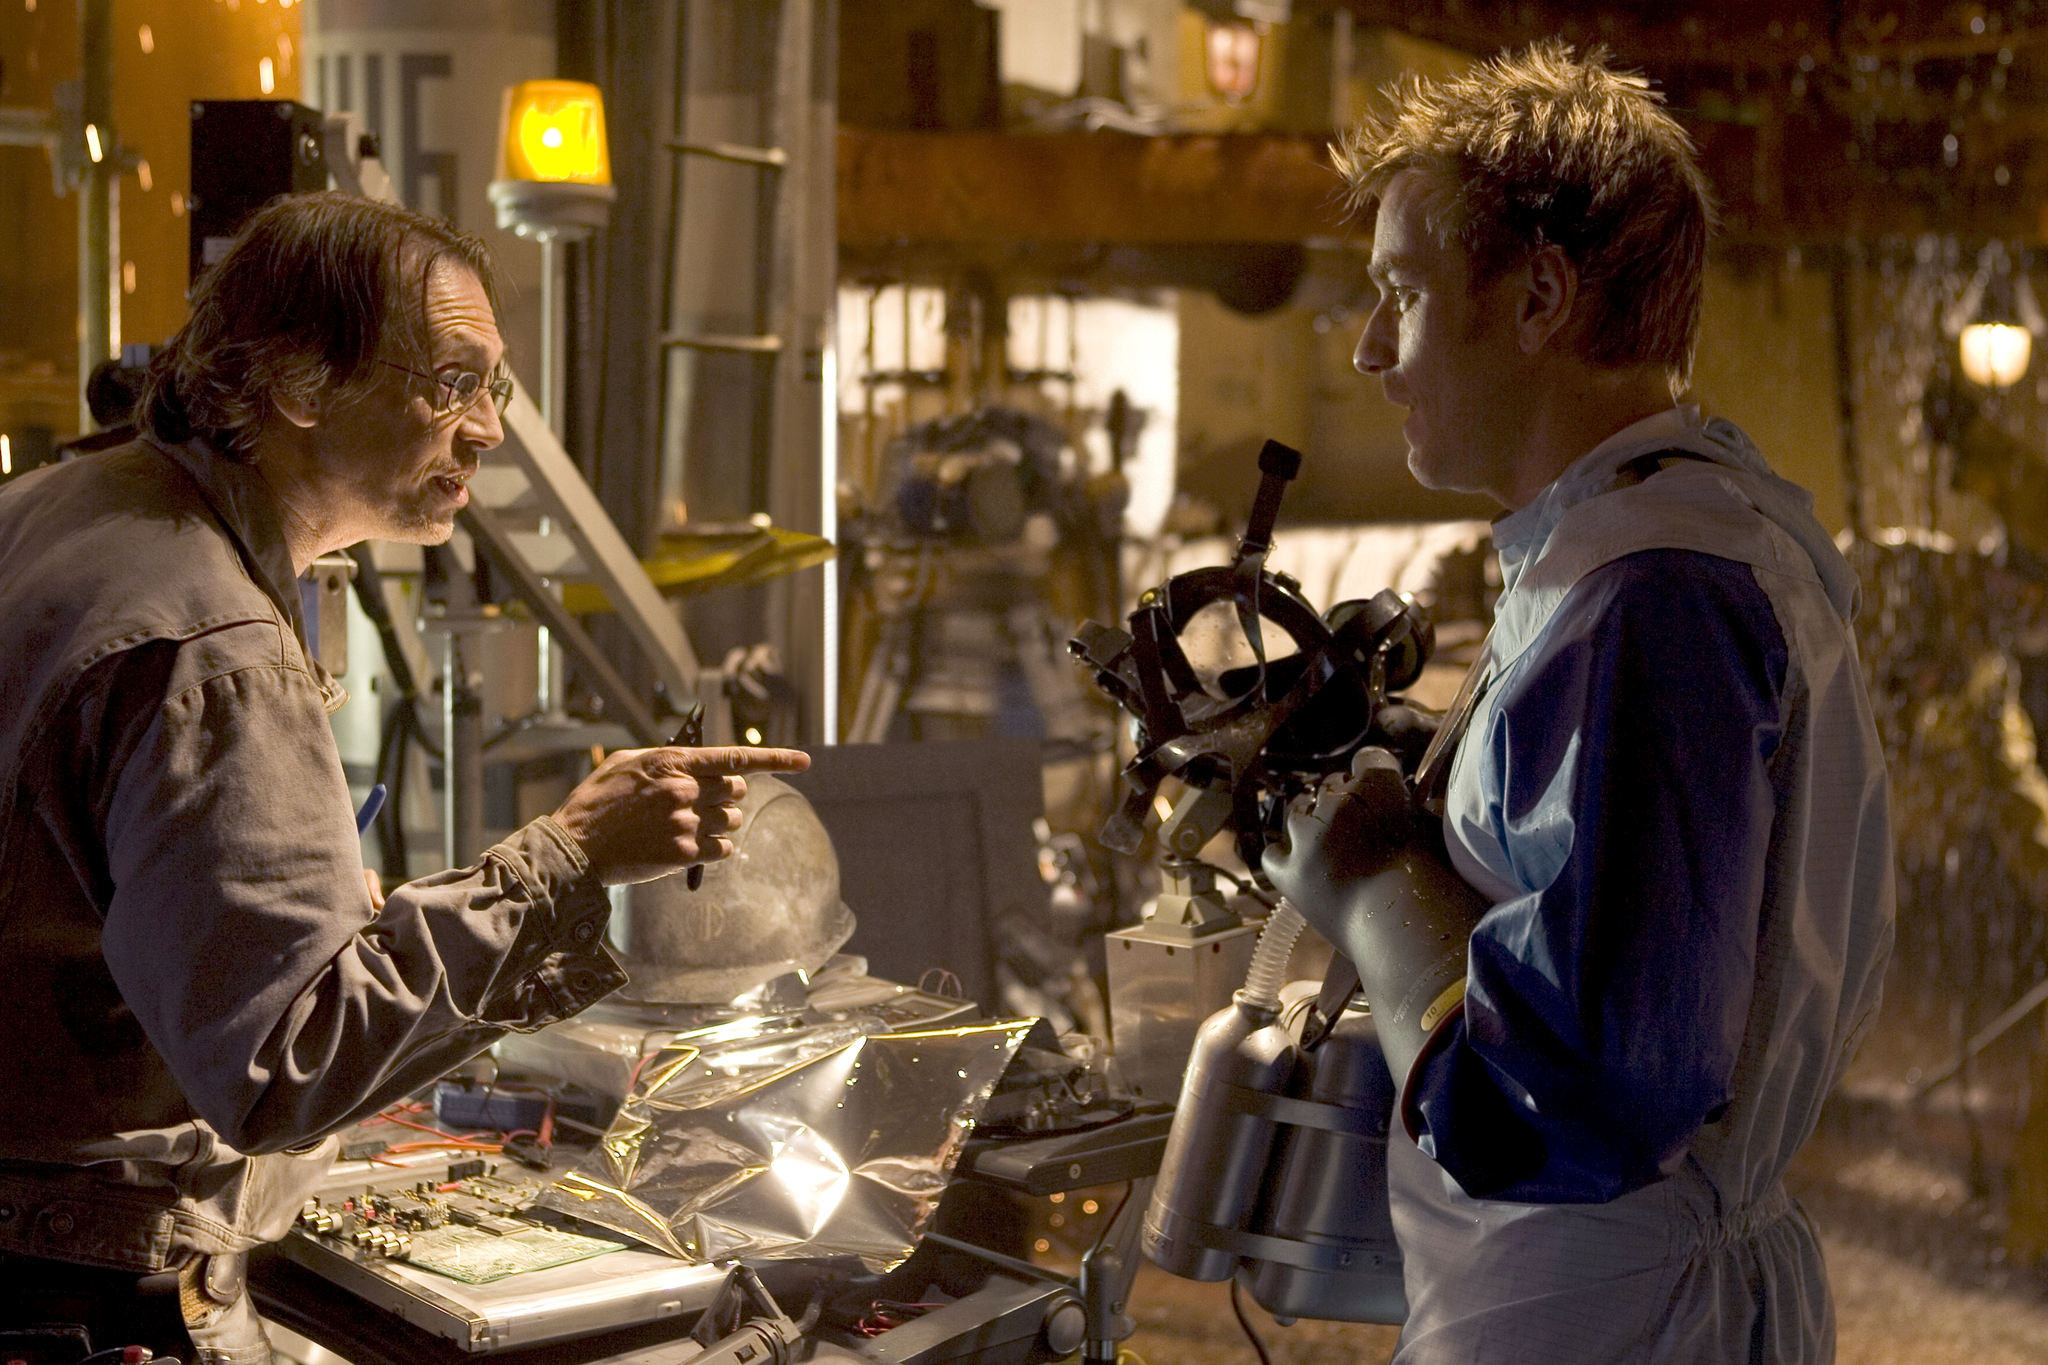 Steve Buscemi and Ewan McGregor in The Island (2005)